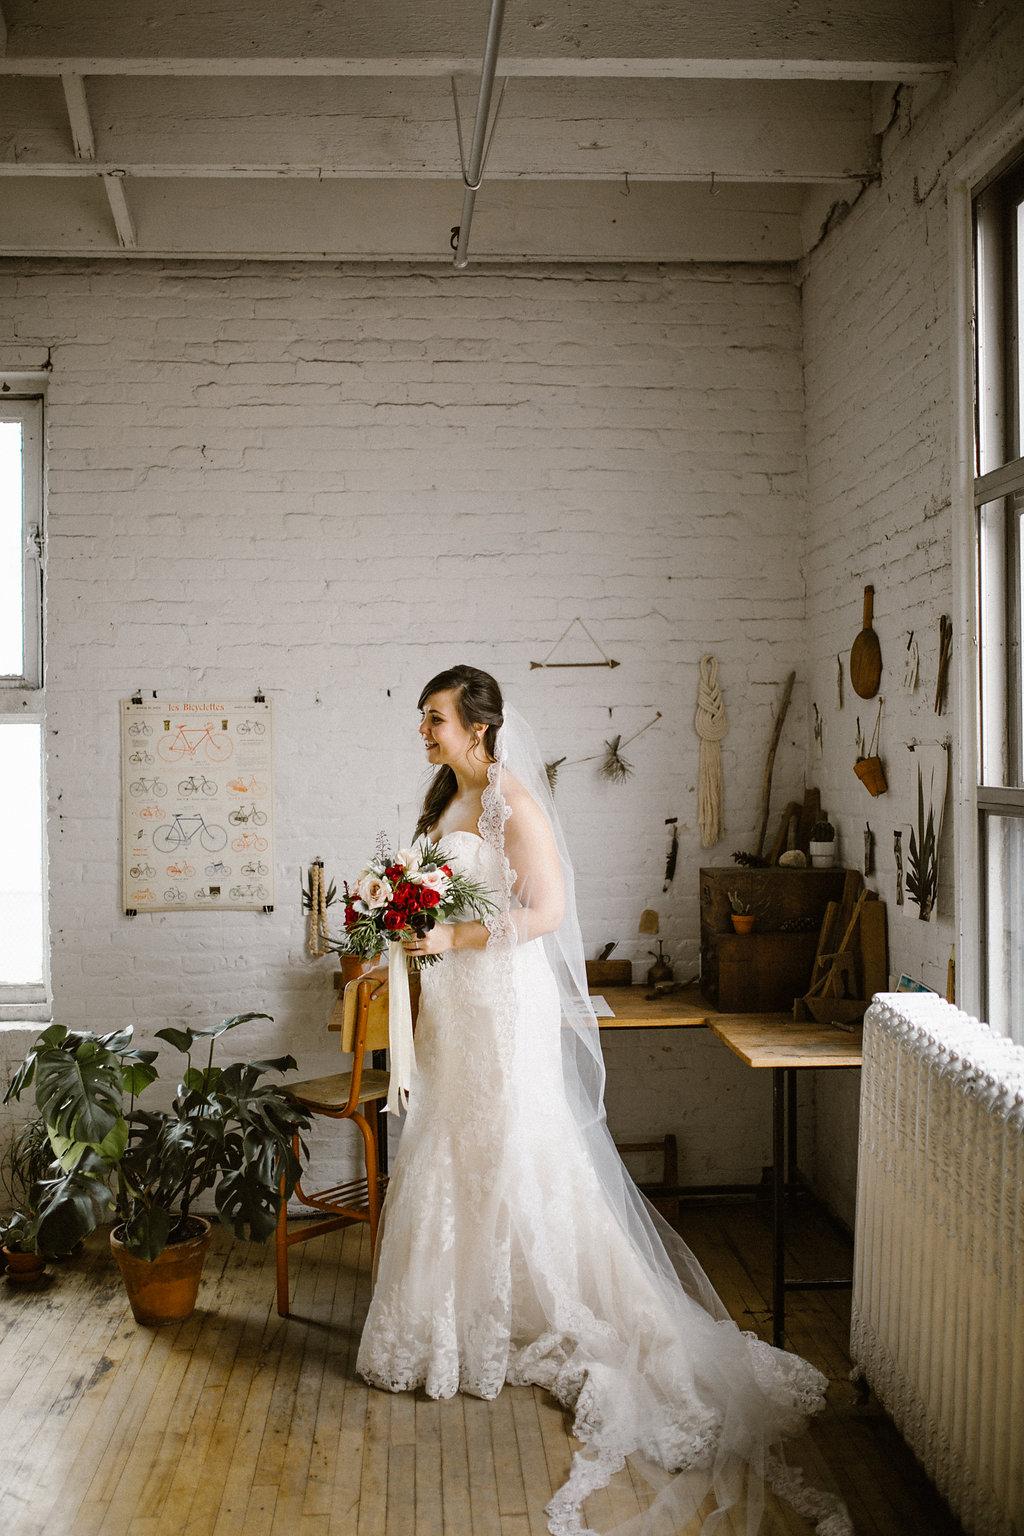 Winnipeg Wedding - Fall Wedding in Winnipeg